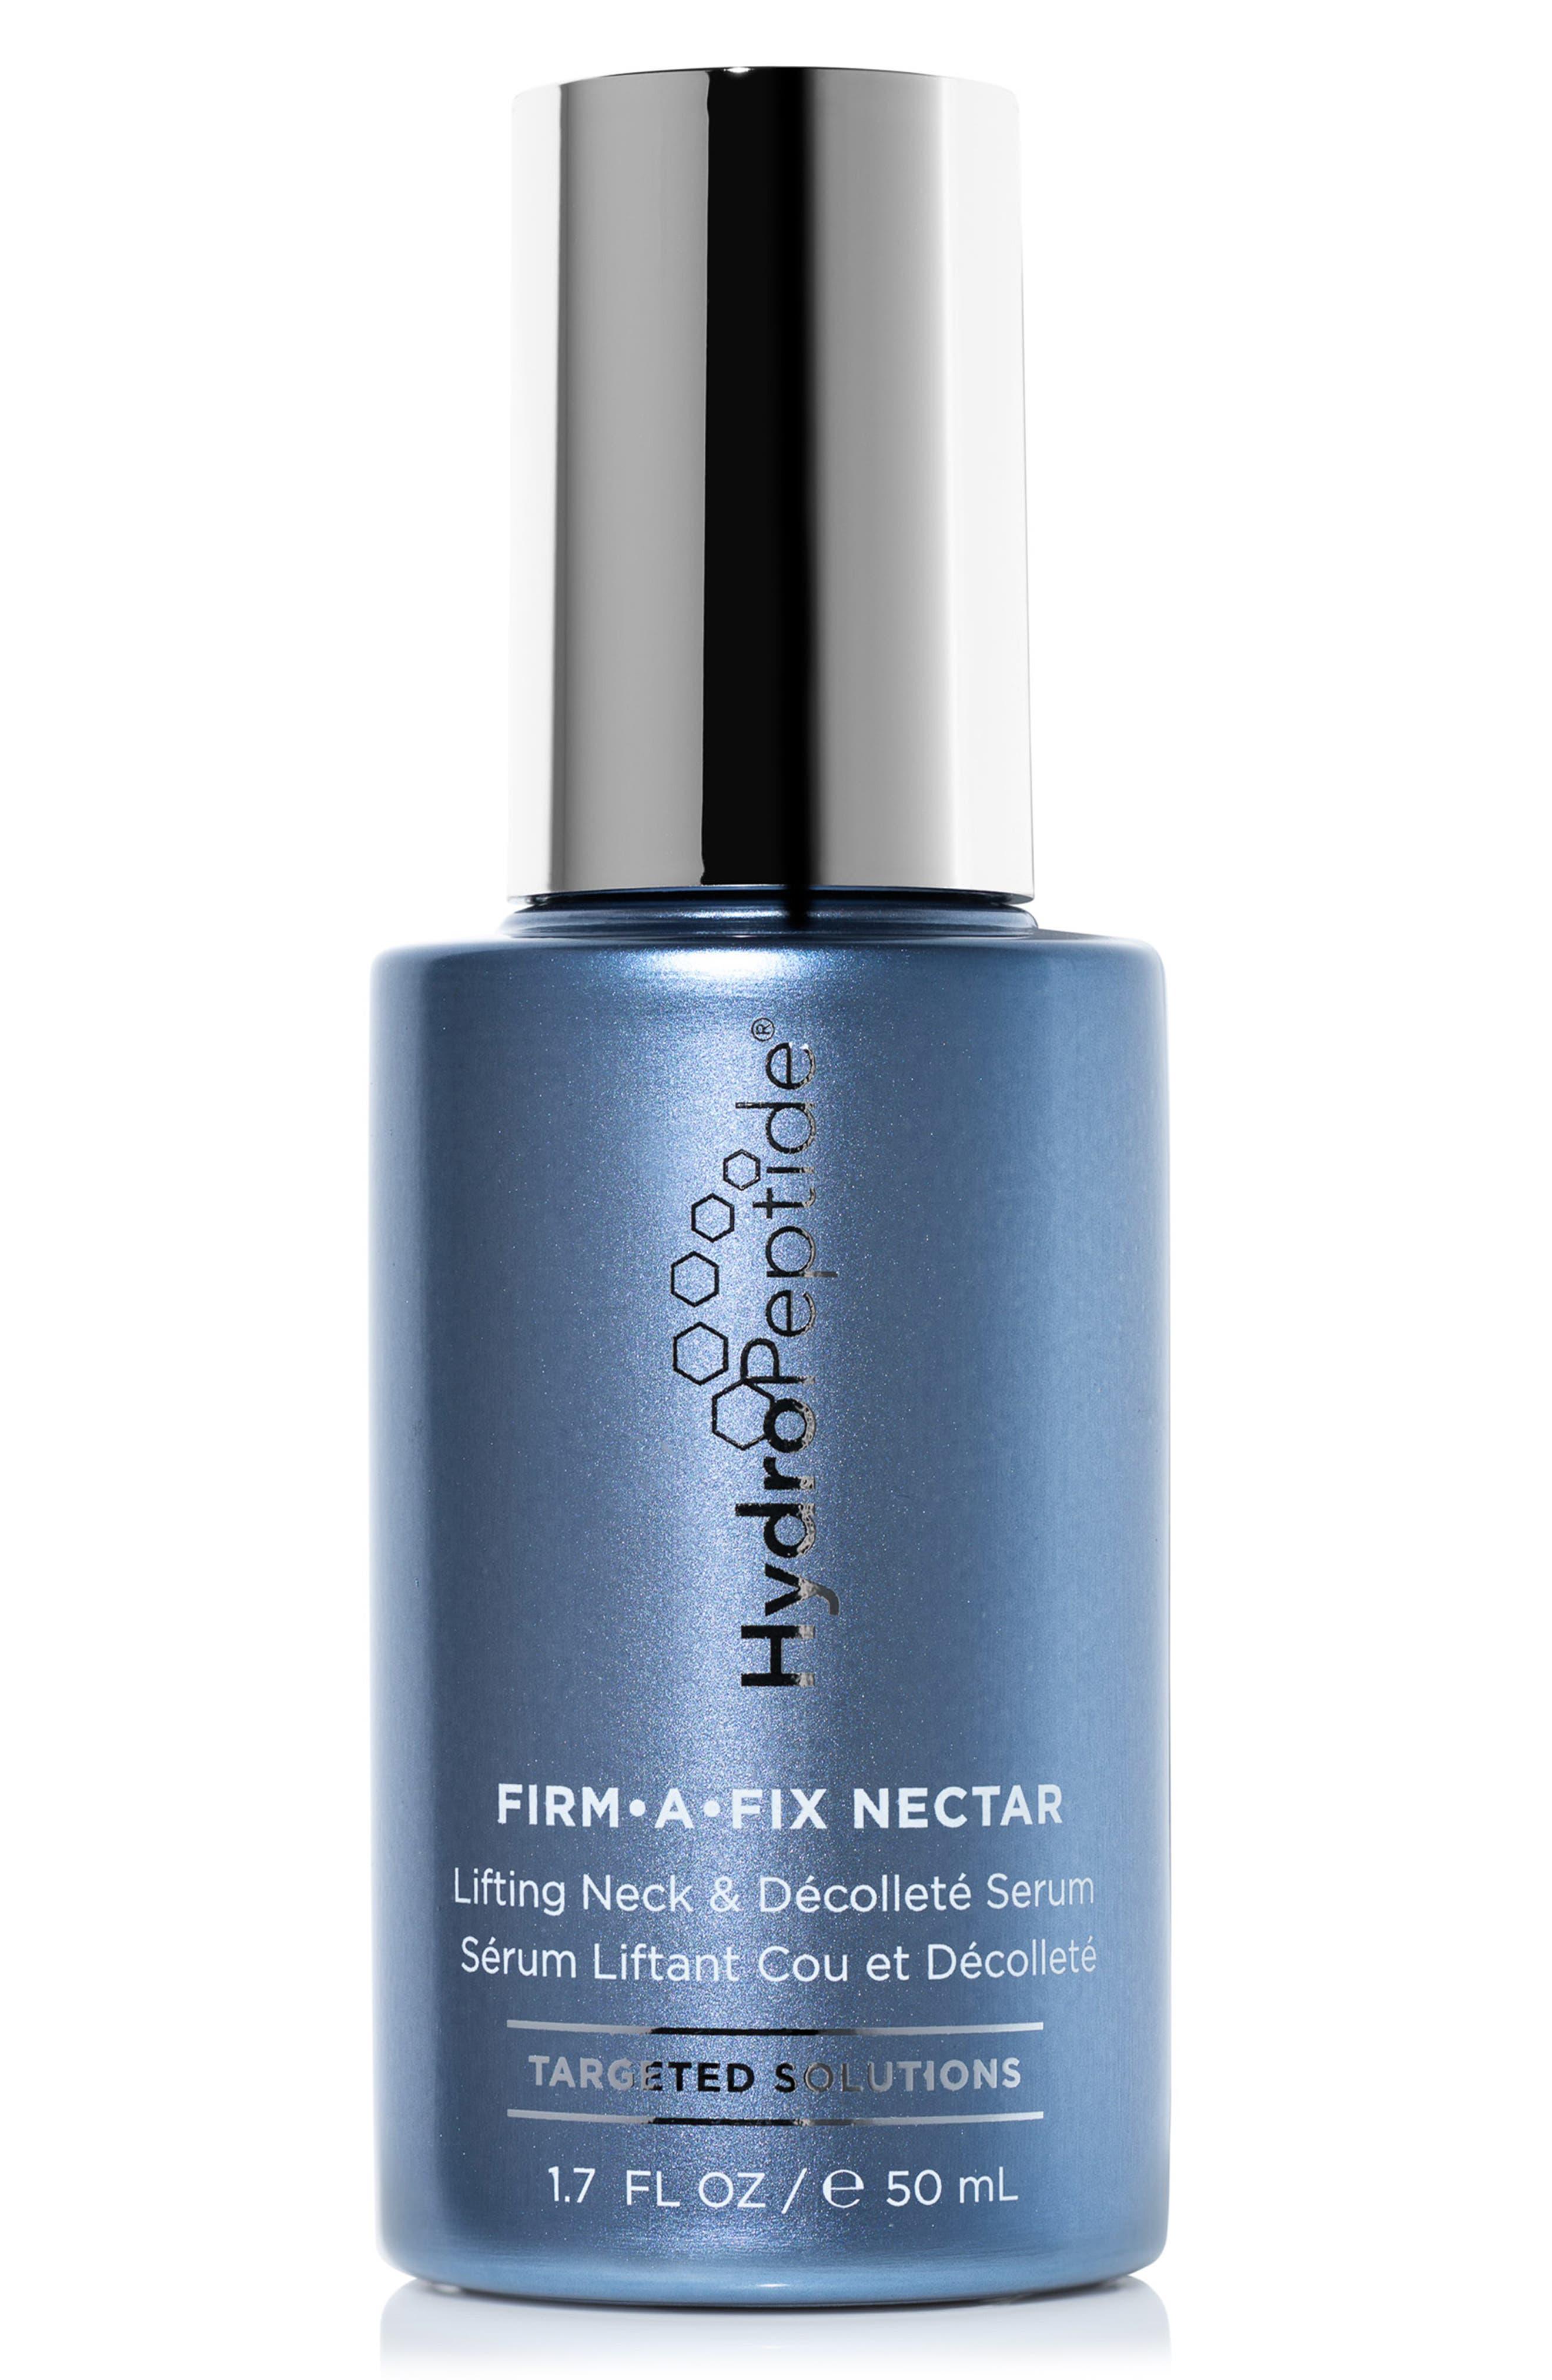 Hydrapeptide Firm-A-Fix Nectar Lifting Neck & Decollete Serum